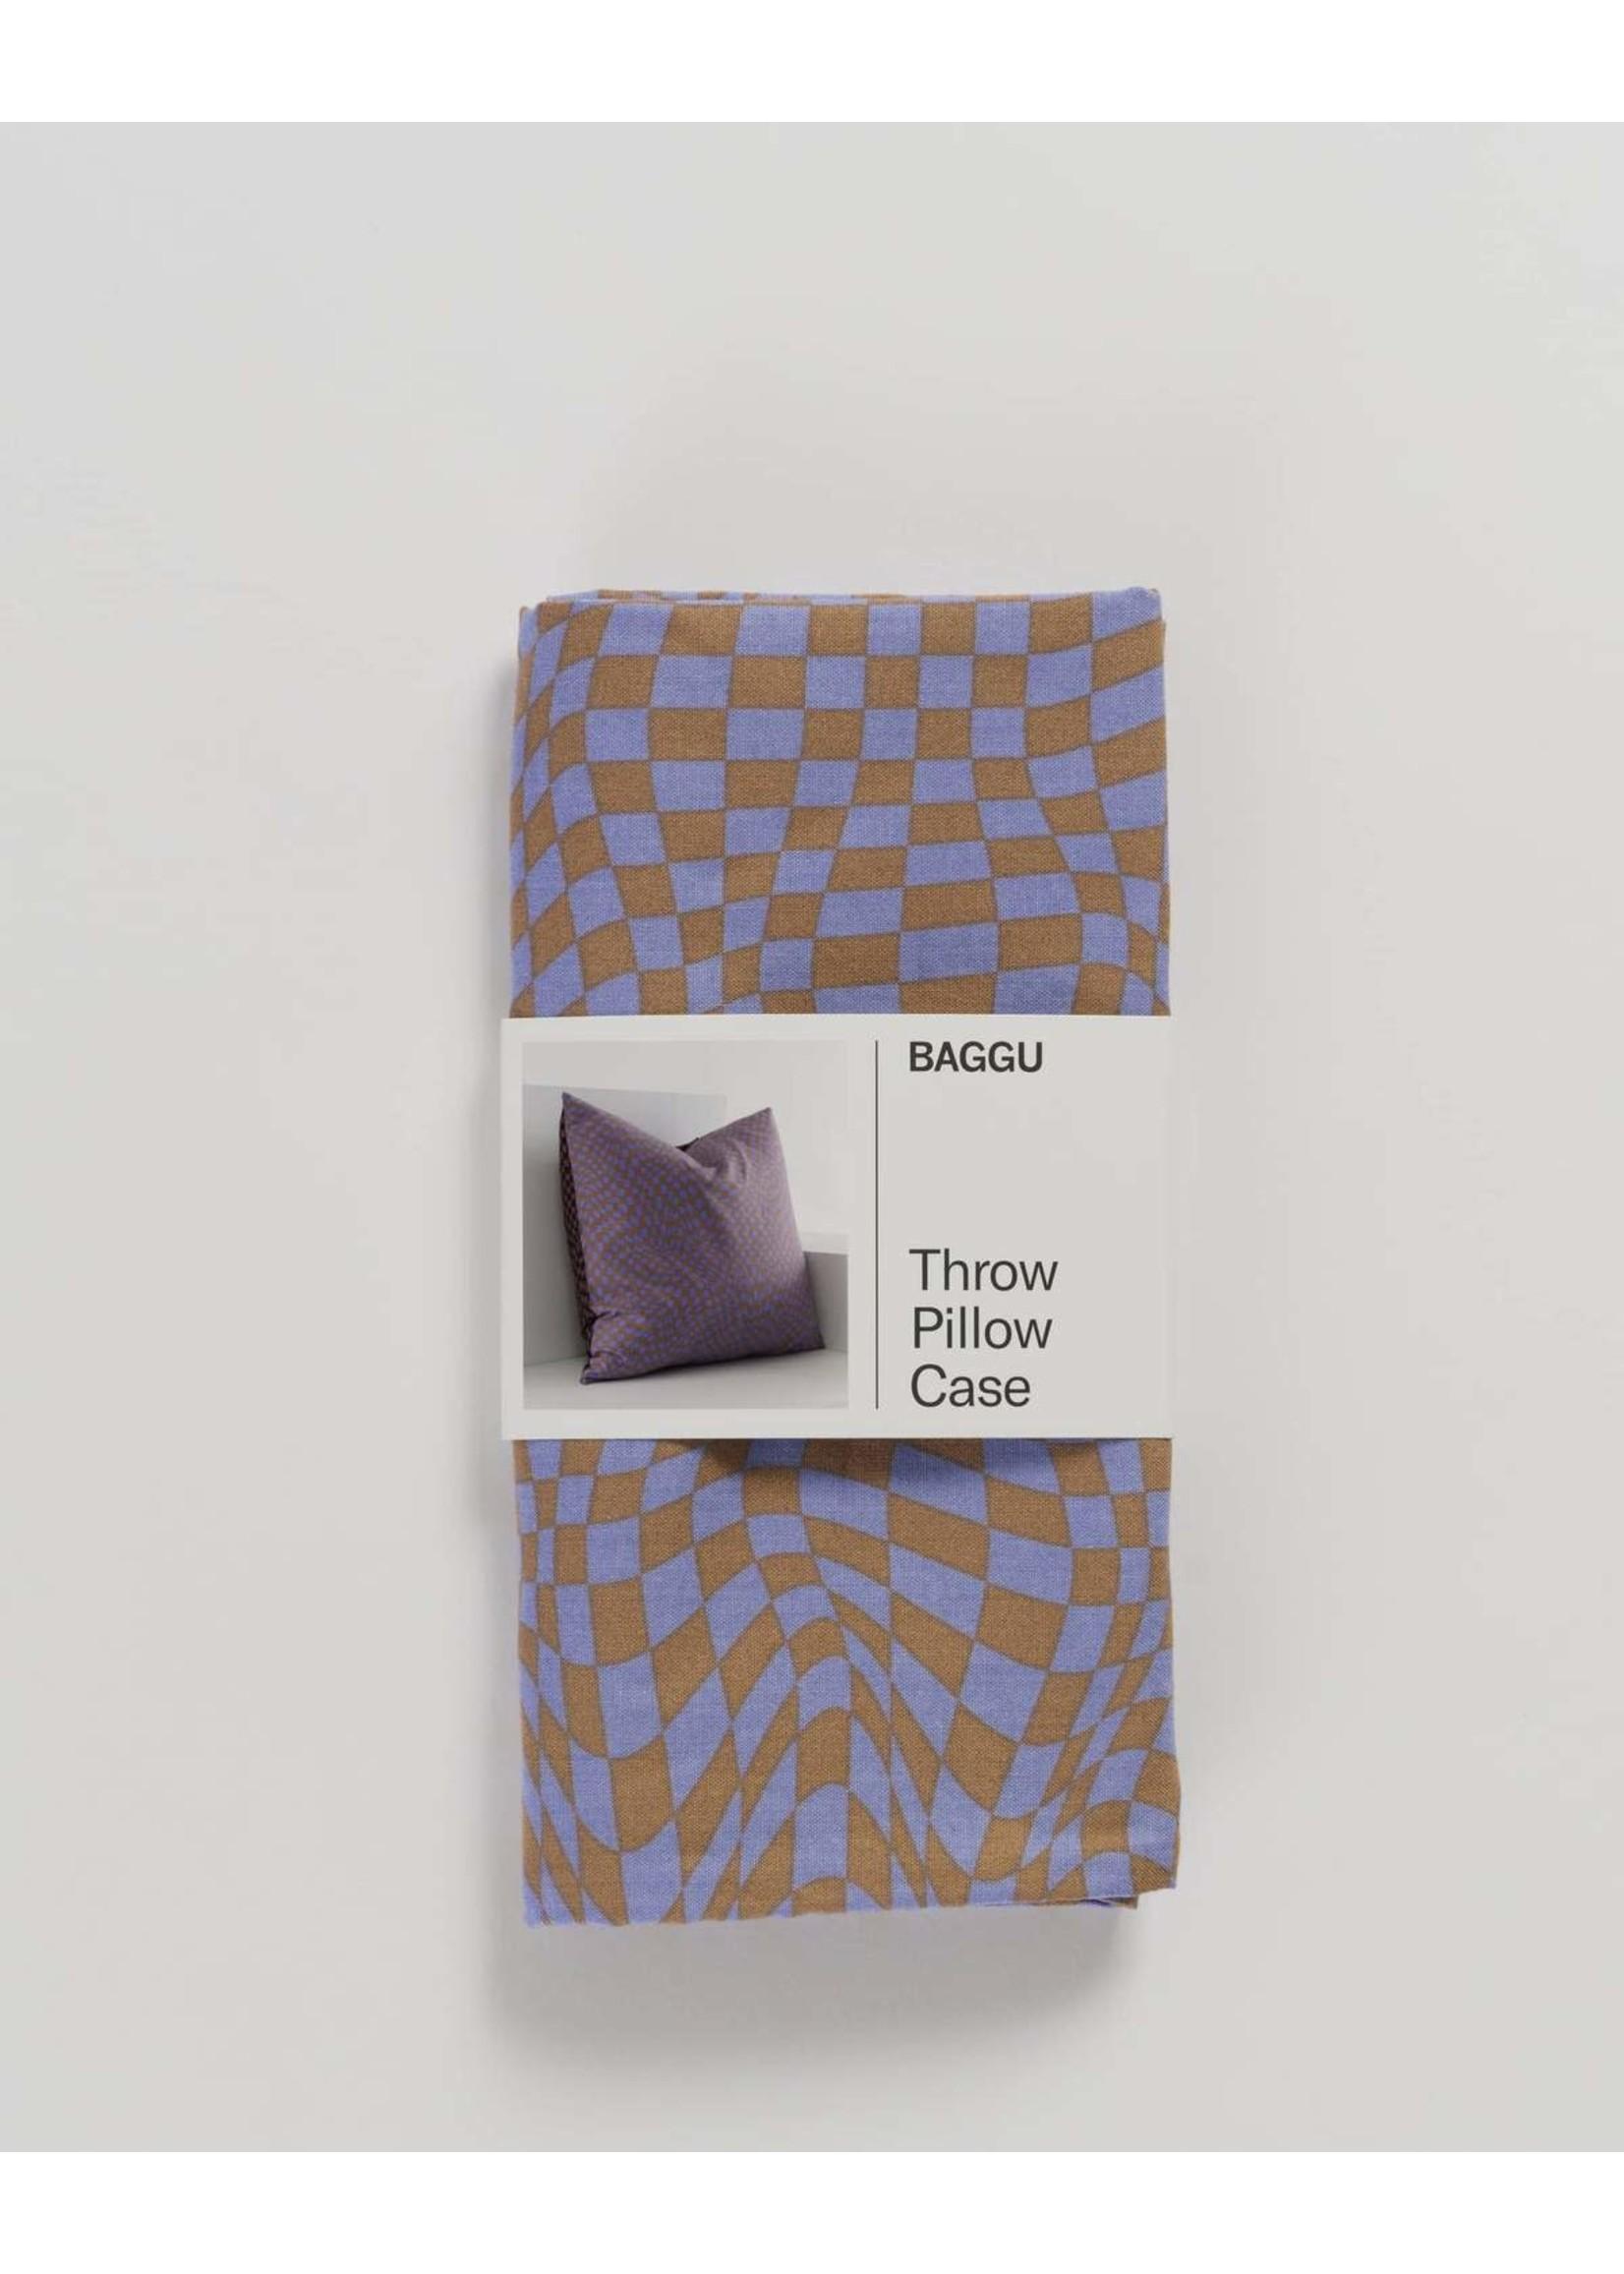 Baggu Baggu Throw Pillow Case - Trippy Checker Mix